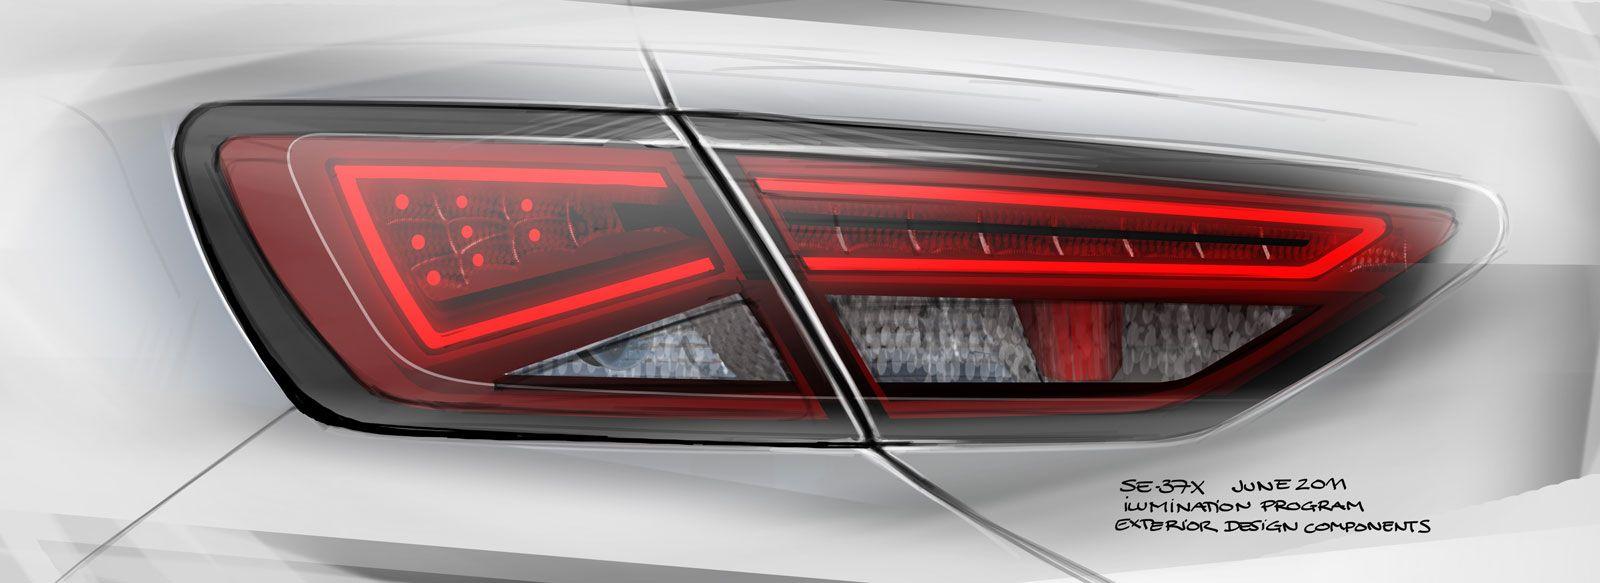 Seat leon st tail lamp design sketch car body design